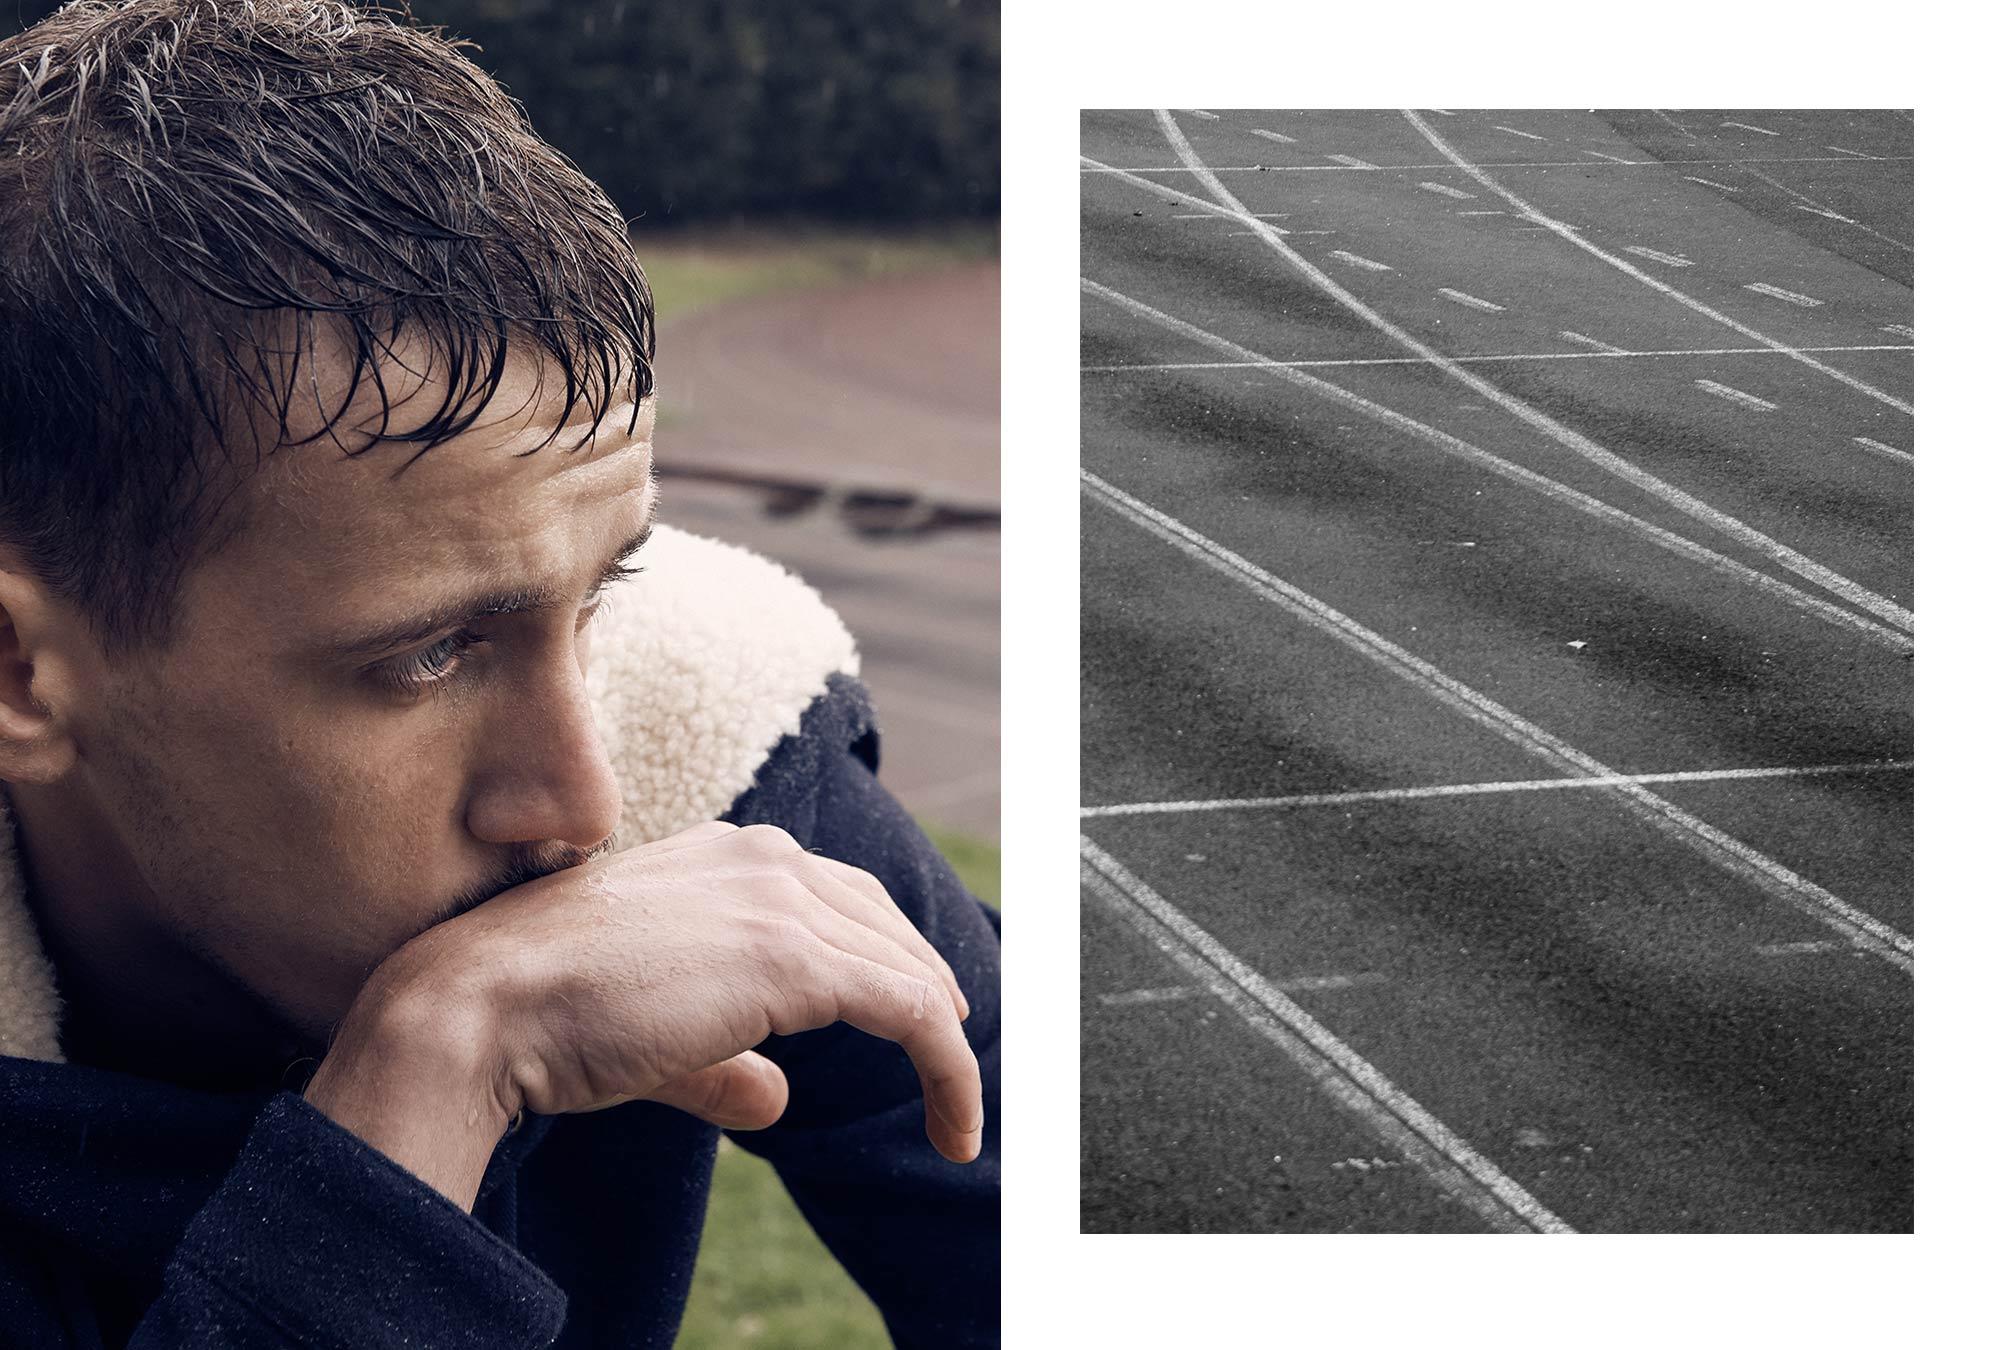 Florian renner acne petrie 06